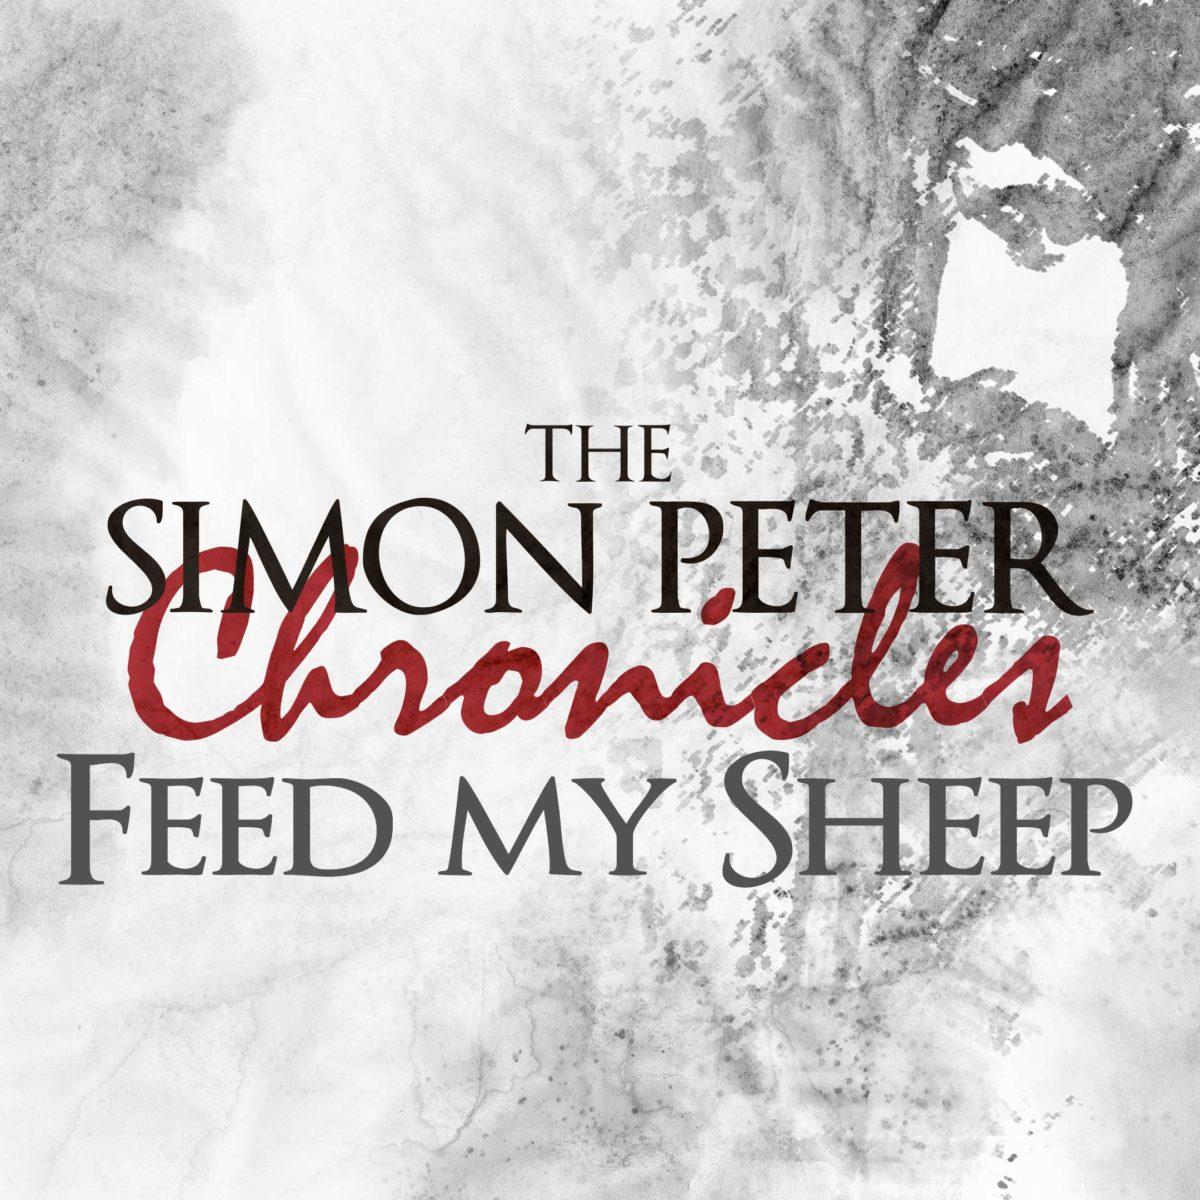 Sermon Feed My Sheep: The Simon Peter Chronicles: Feed My Sheep Script